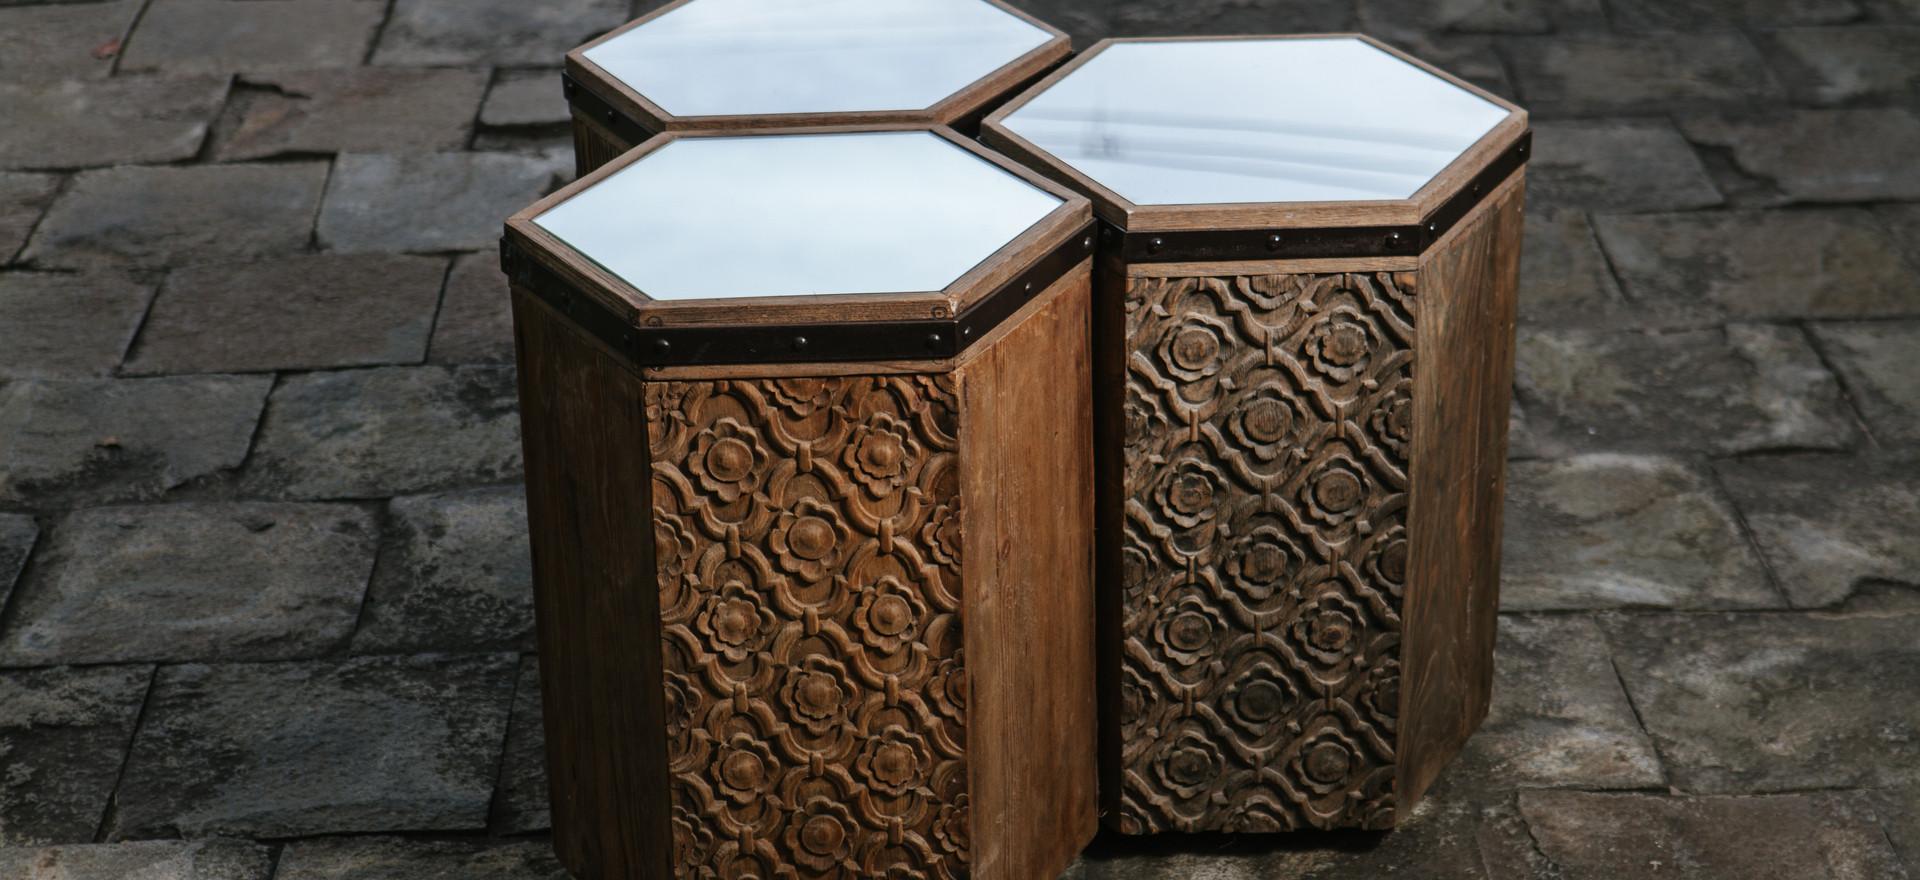 Lotus side Tables